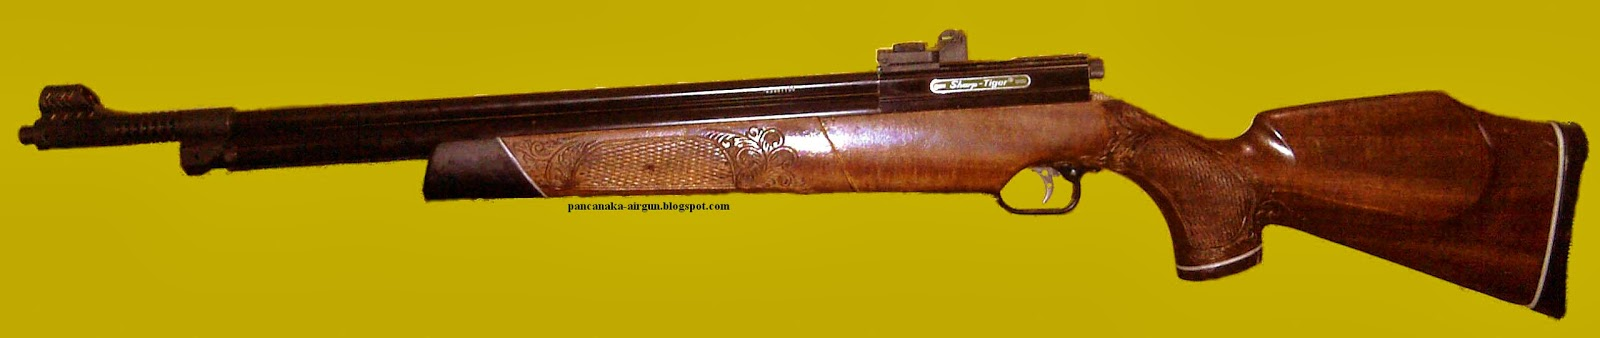 Pancanaka Airgun Works  Sharp Tiger Long Barrel  Macan